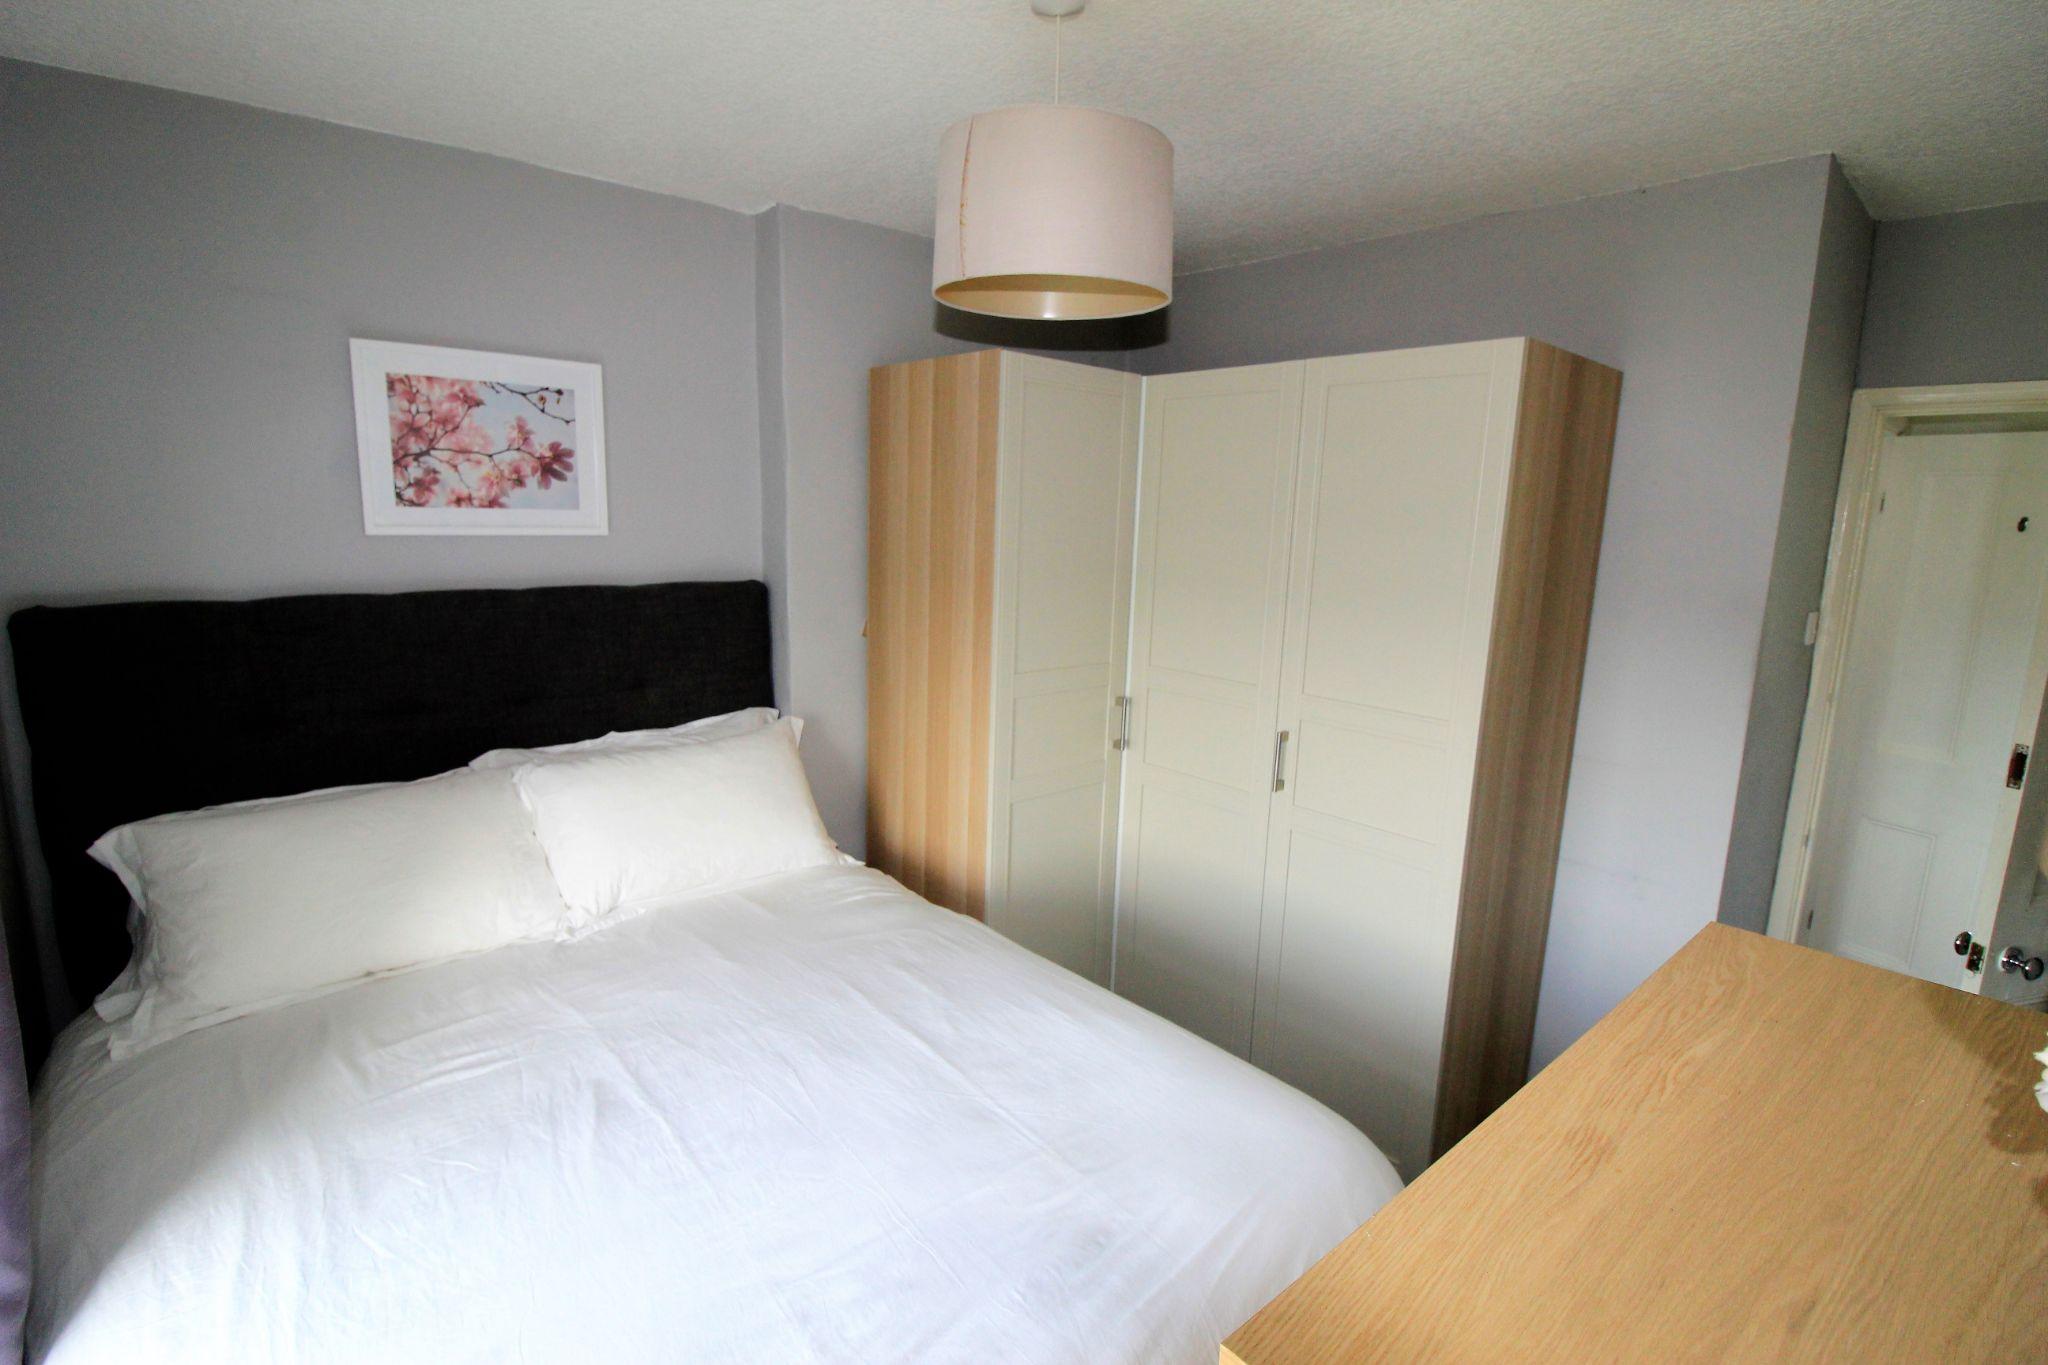 2 bedroom cottage house SSTC in Huddersfield - Bedroom 1